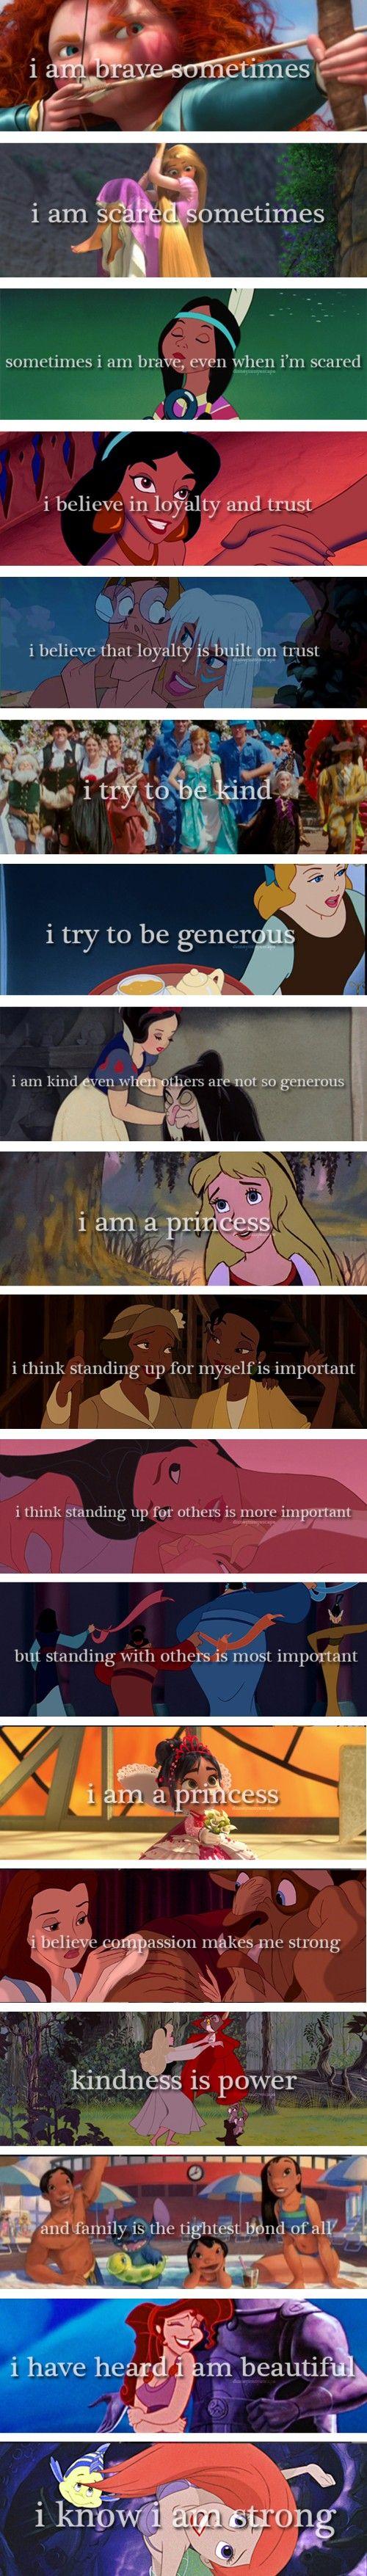 I am a Princess.